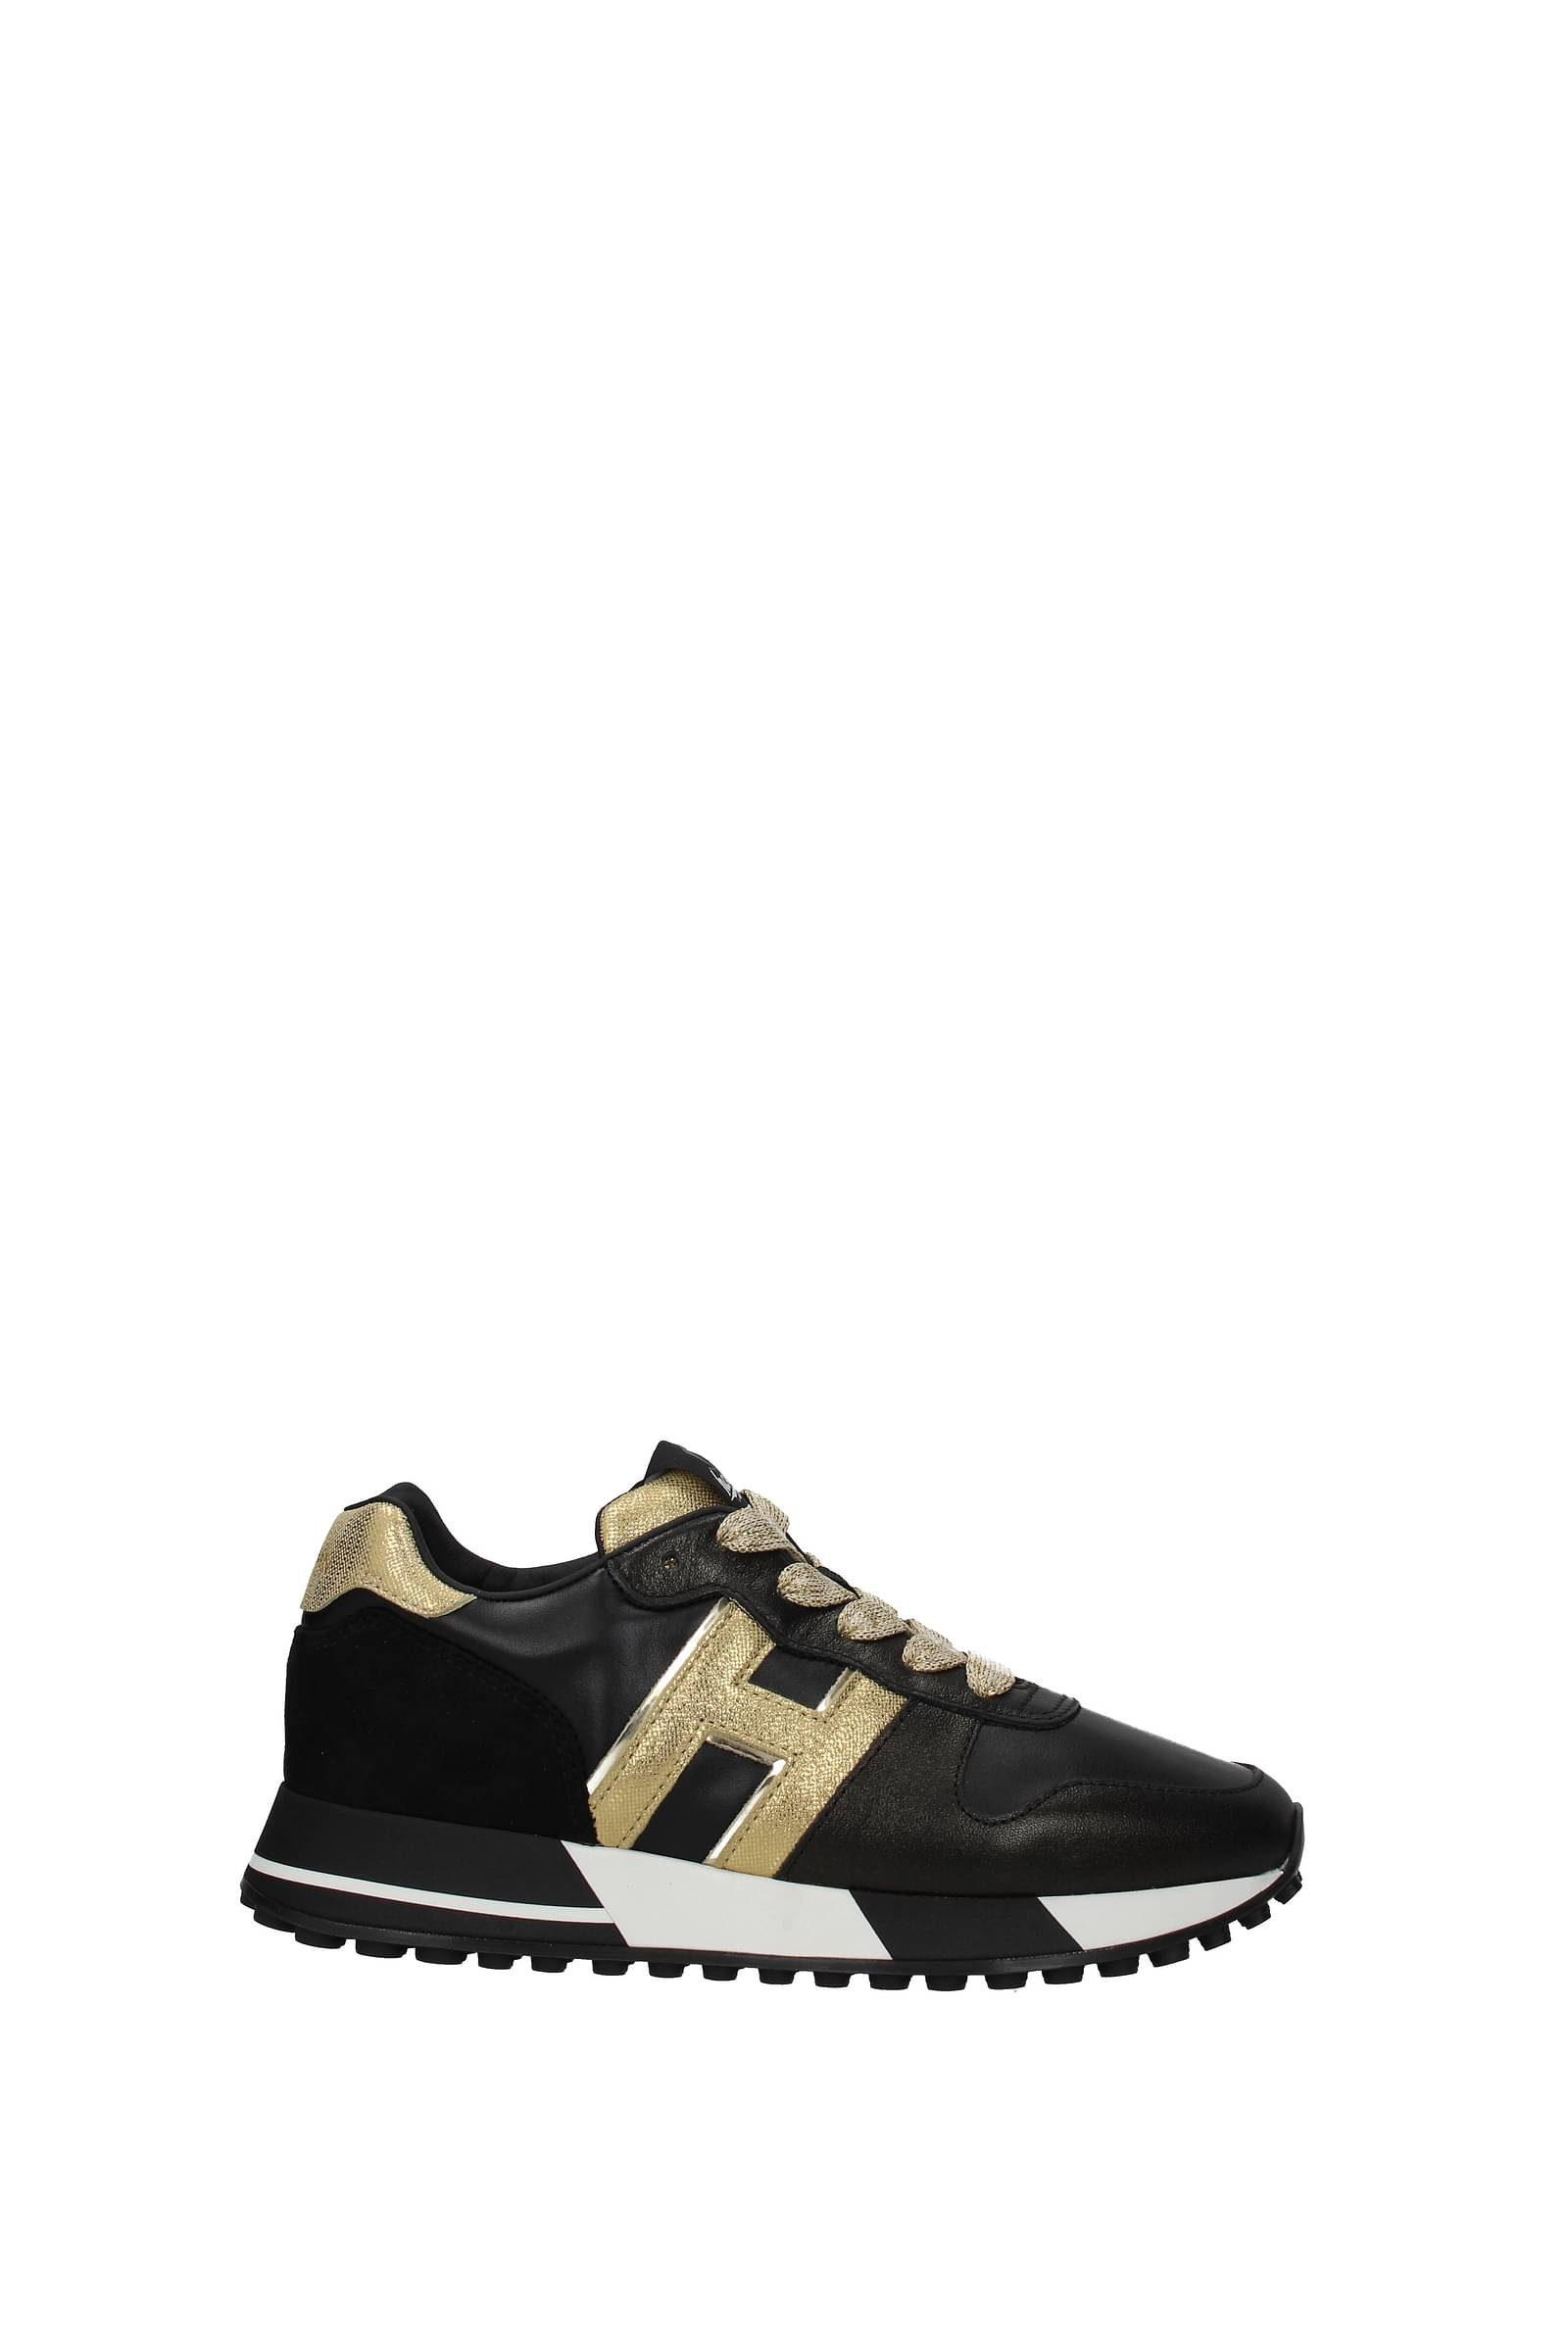 Hogan Sneakers Donna Pelle Nero Oro